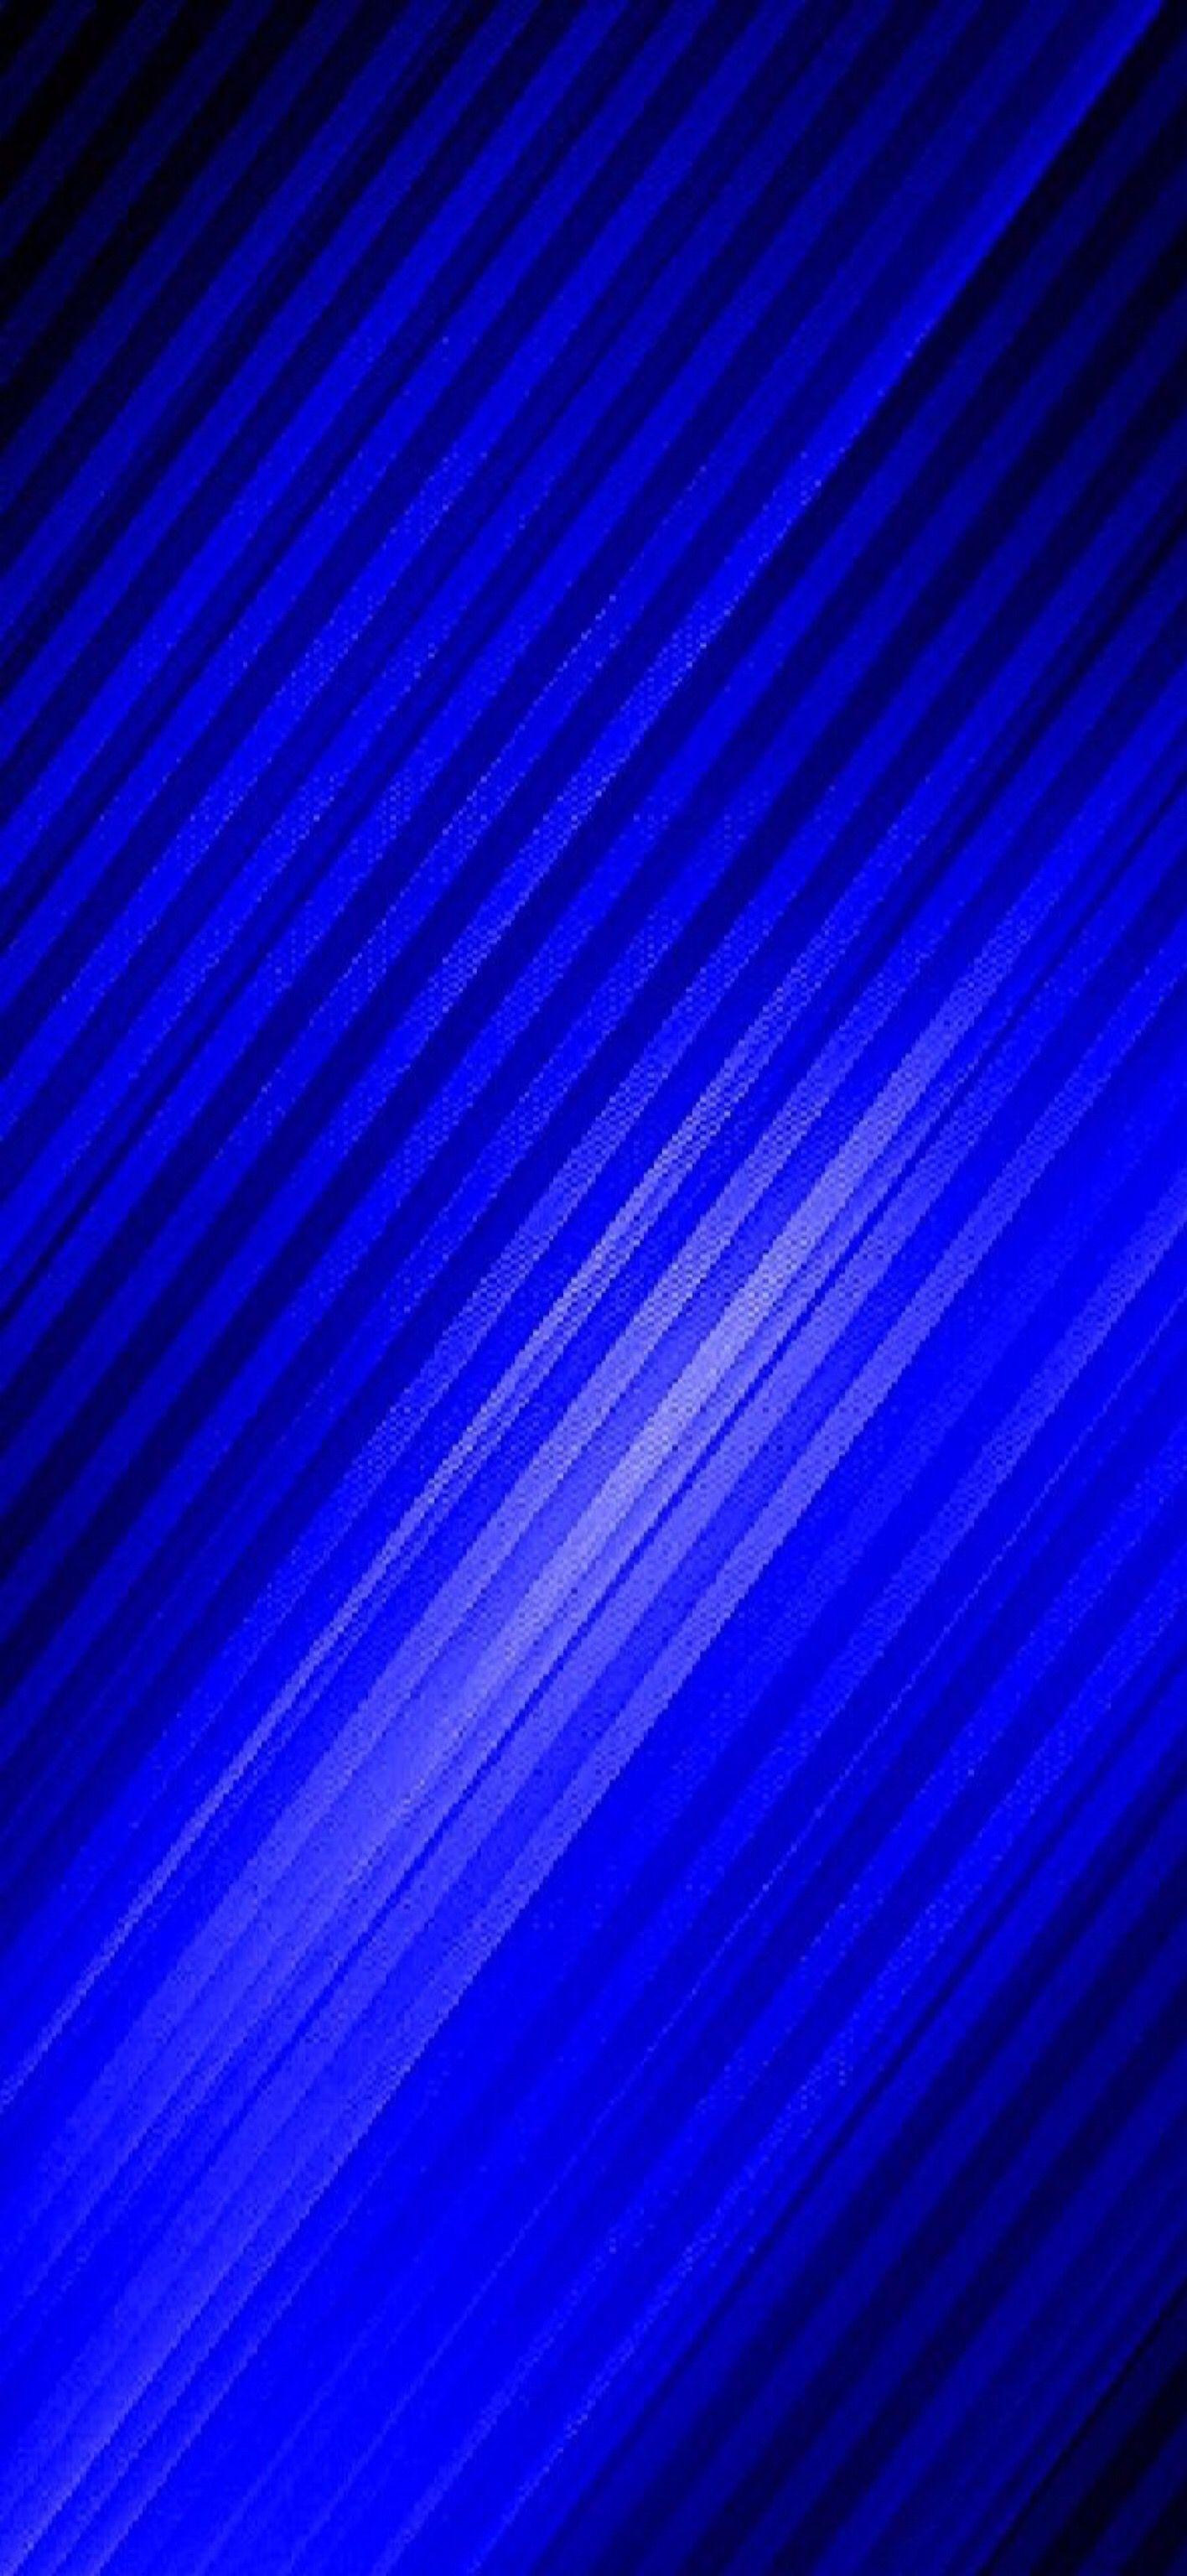 Wallpaper Cobalt Blue 002 resized for iPhone X Blue